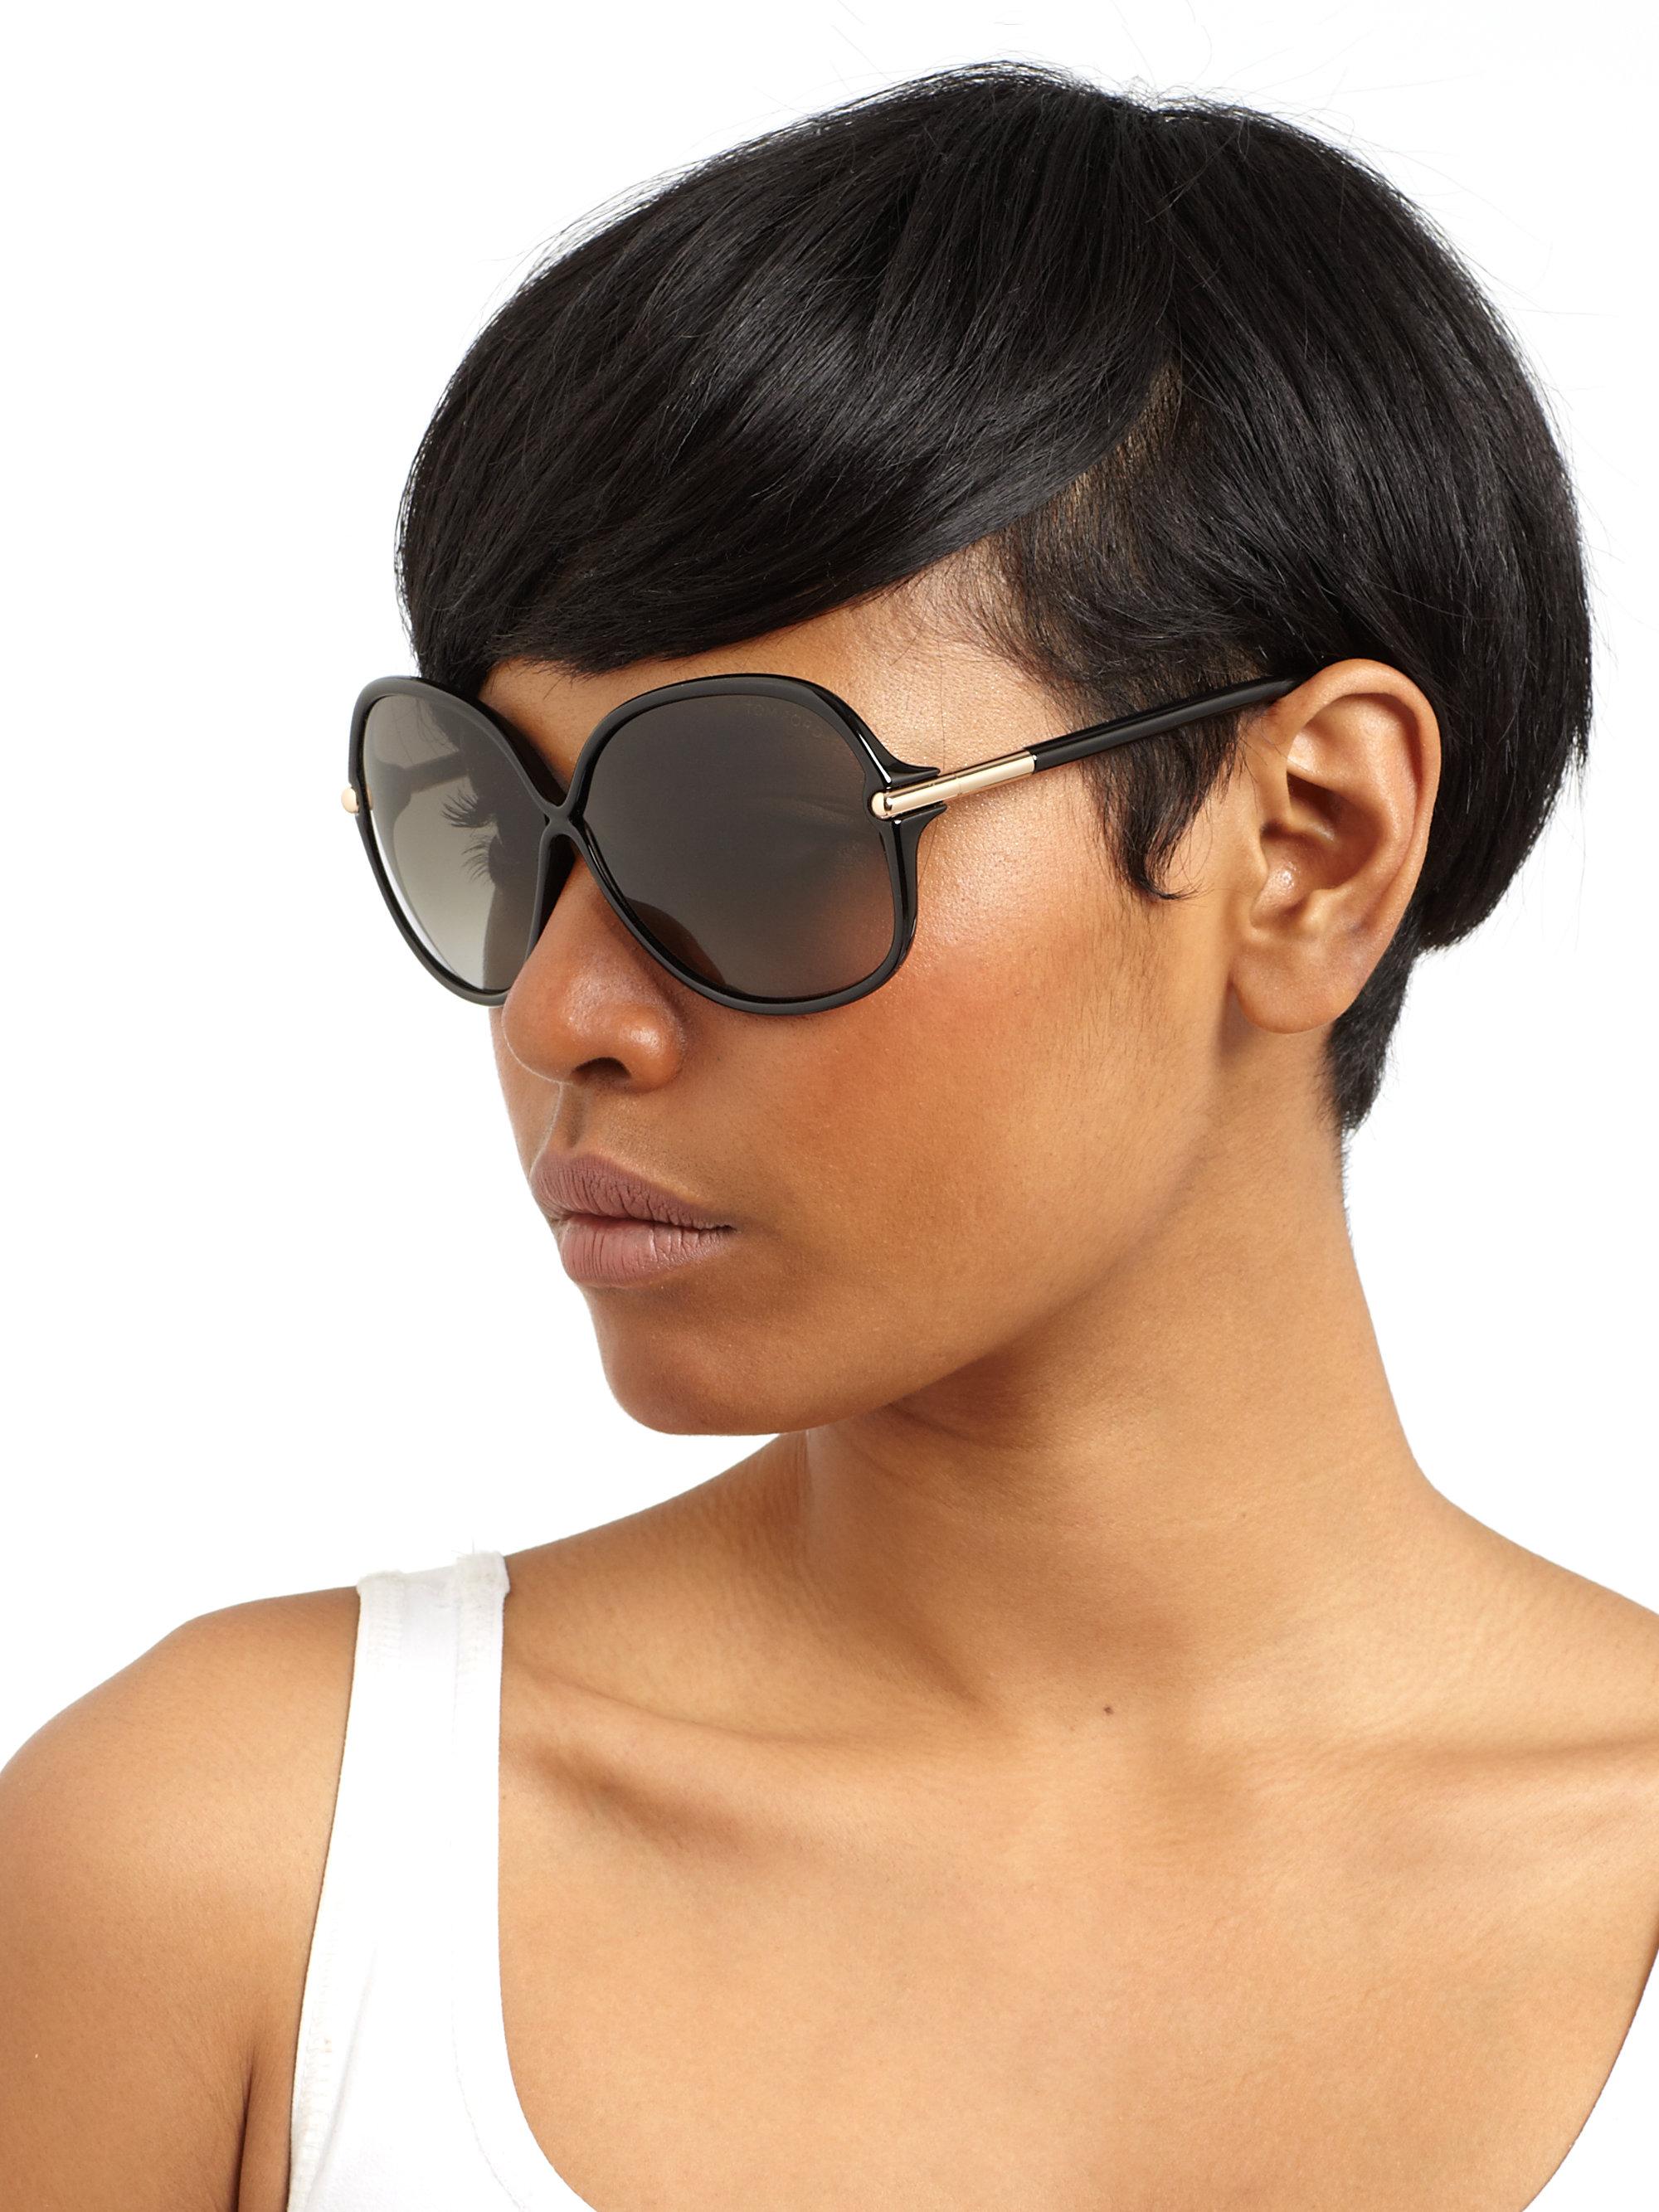 aa0694e6ea Tom Ford Islay Round Sunglasses in Black - Lyst